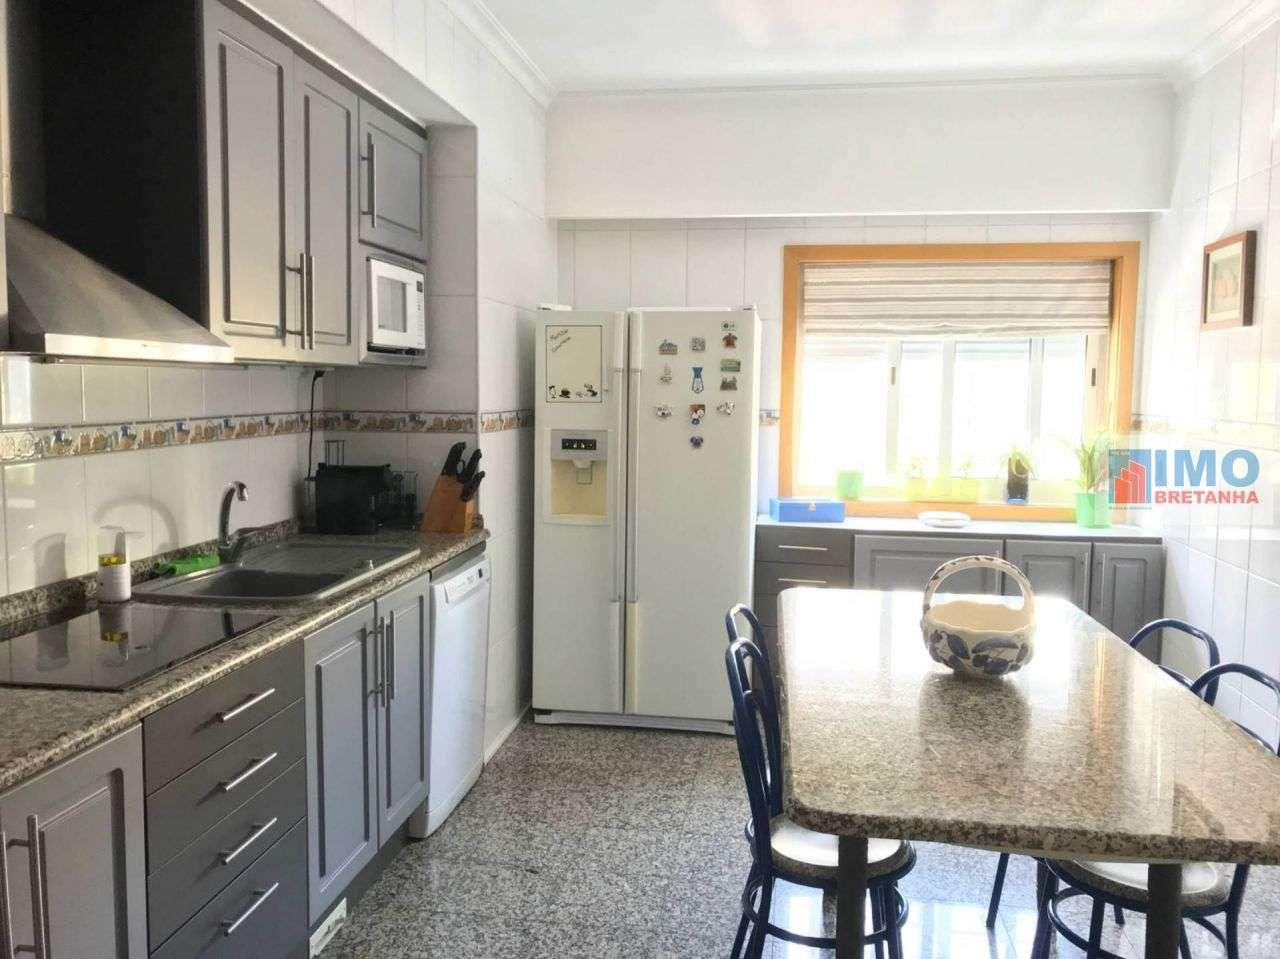 Apartamento para comprar, Boidobra, Castelo Branco - Foto 1